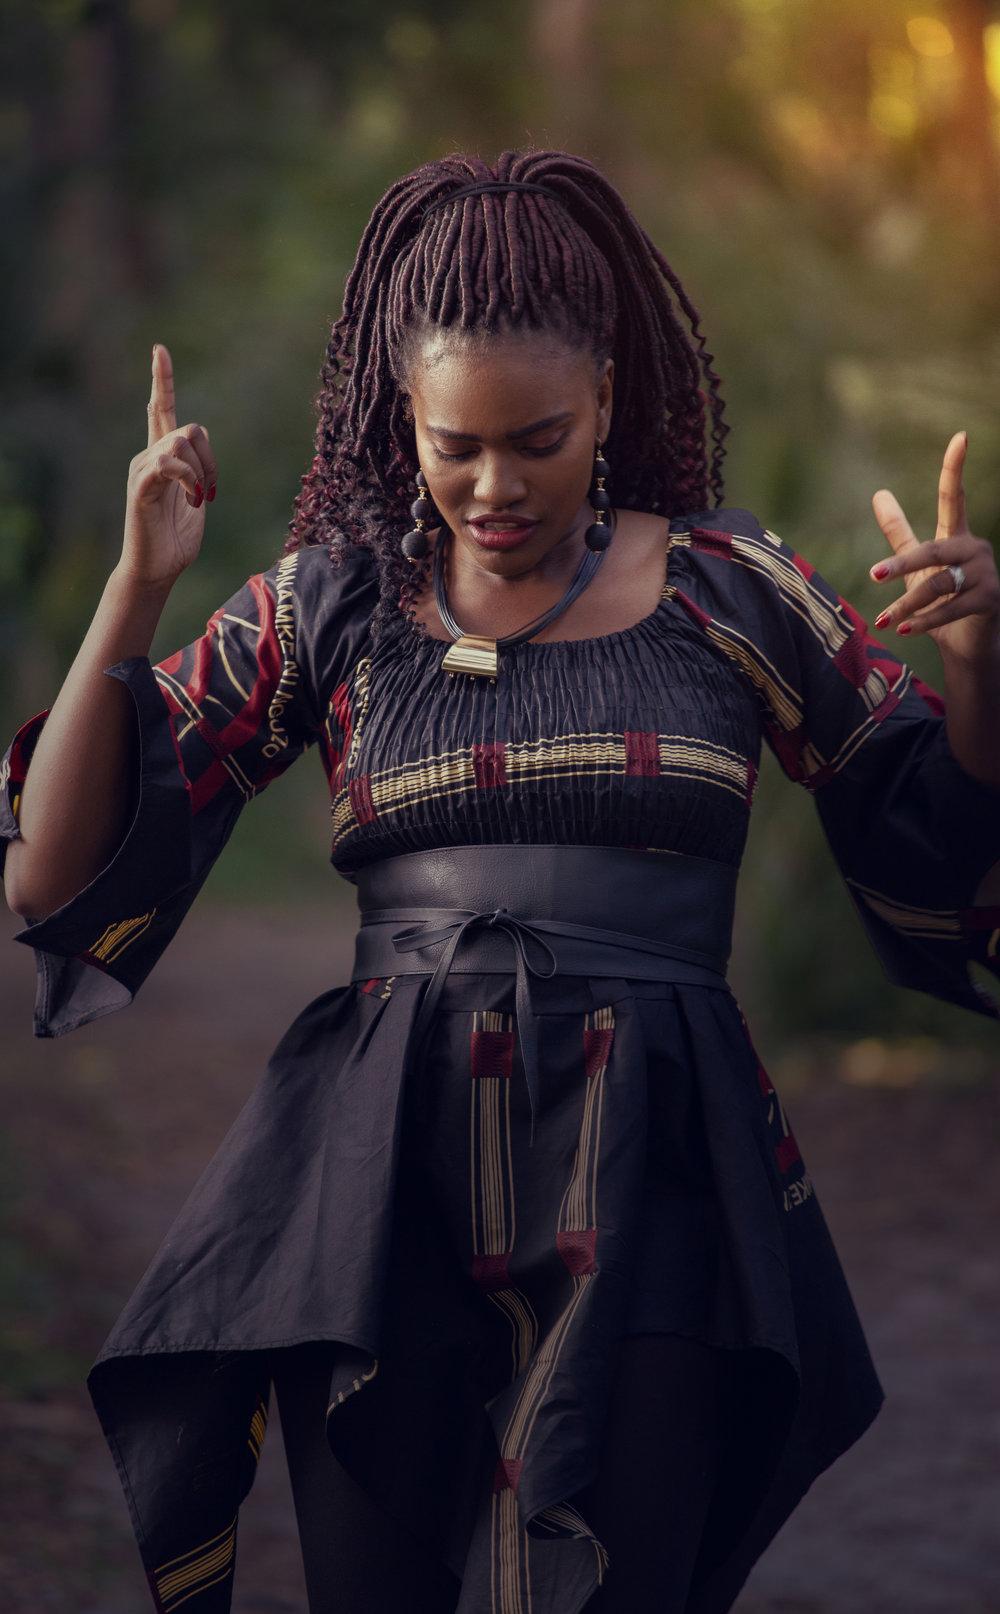 bridgette-african-nigerian-chamber-photography-photo-shoot4.jpg